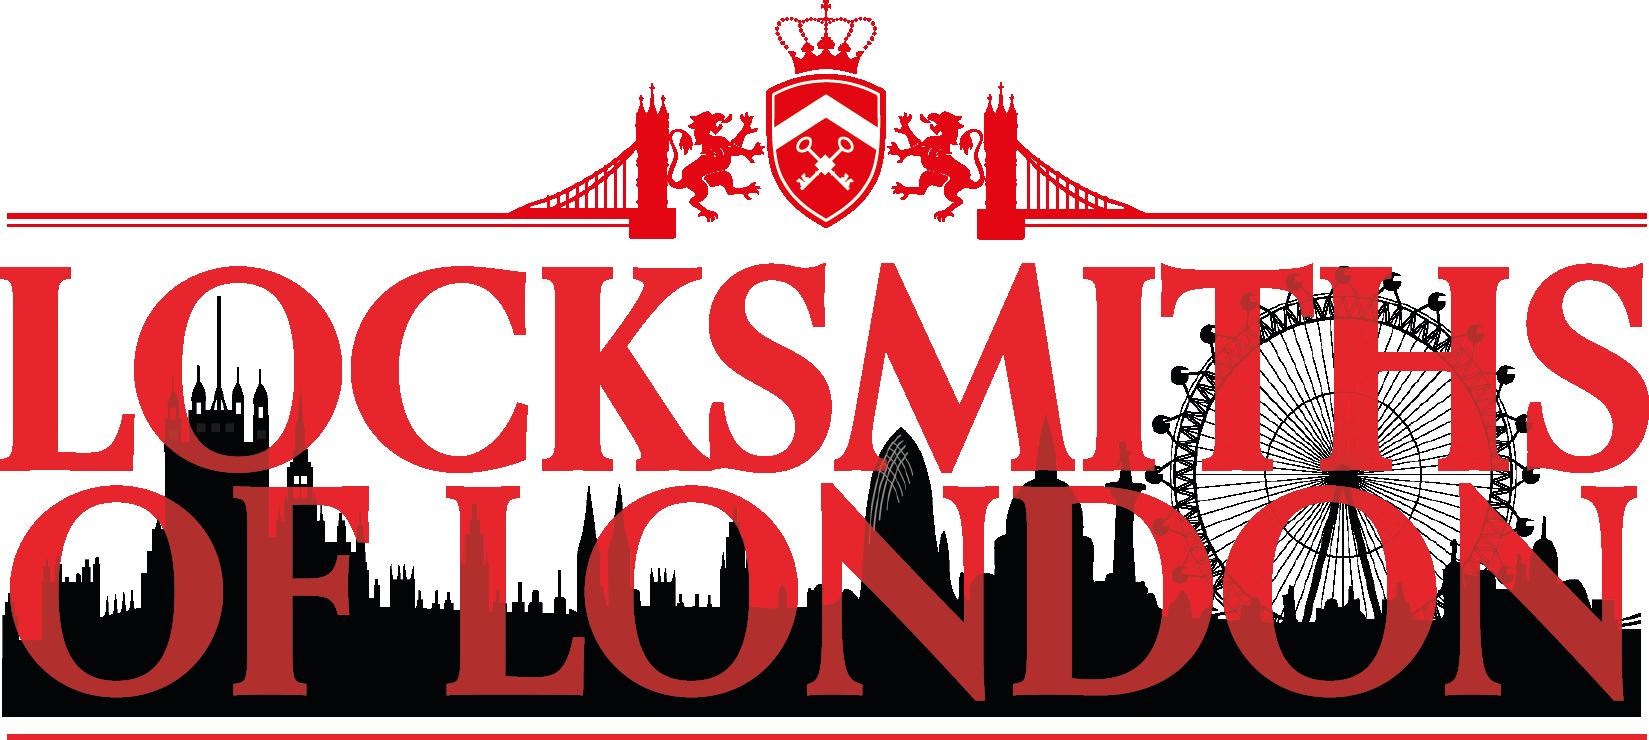 Emergency Locksmith London – Locksmith London – Emergency lock repair London – Key cutting – Security door installation – Locksmith services London – Burglary repairs – Lock fitting